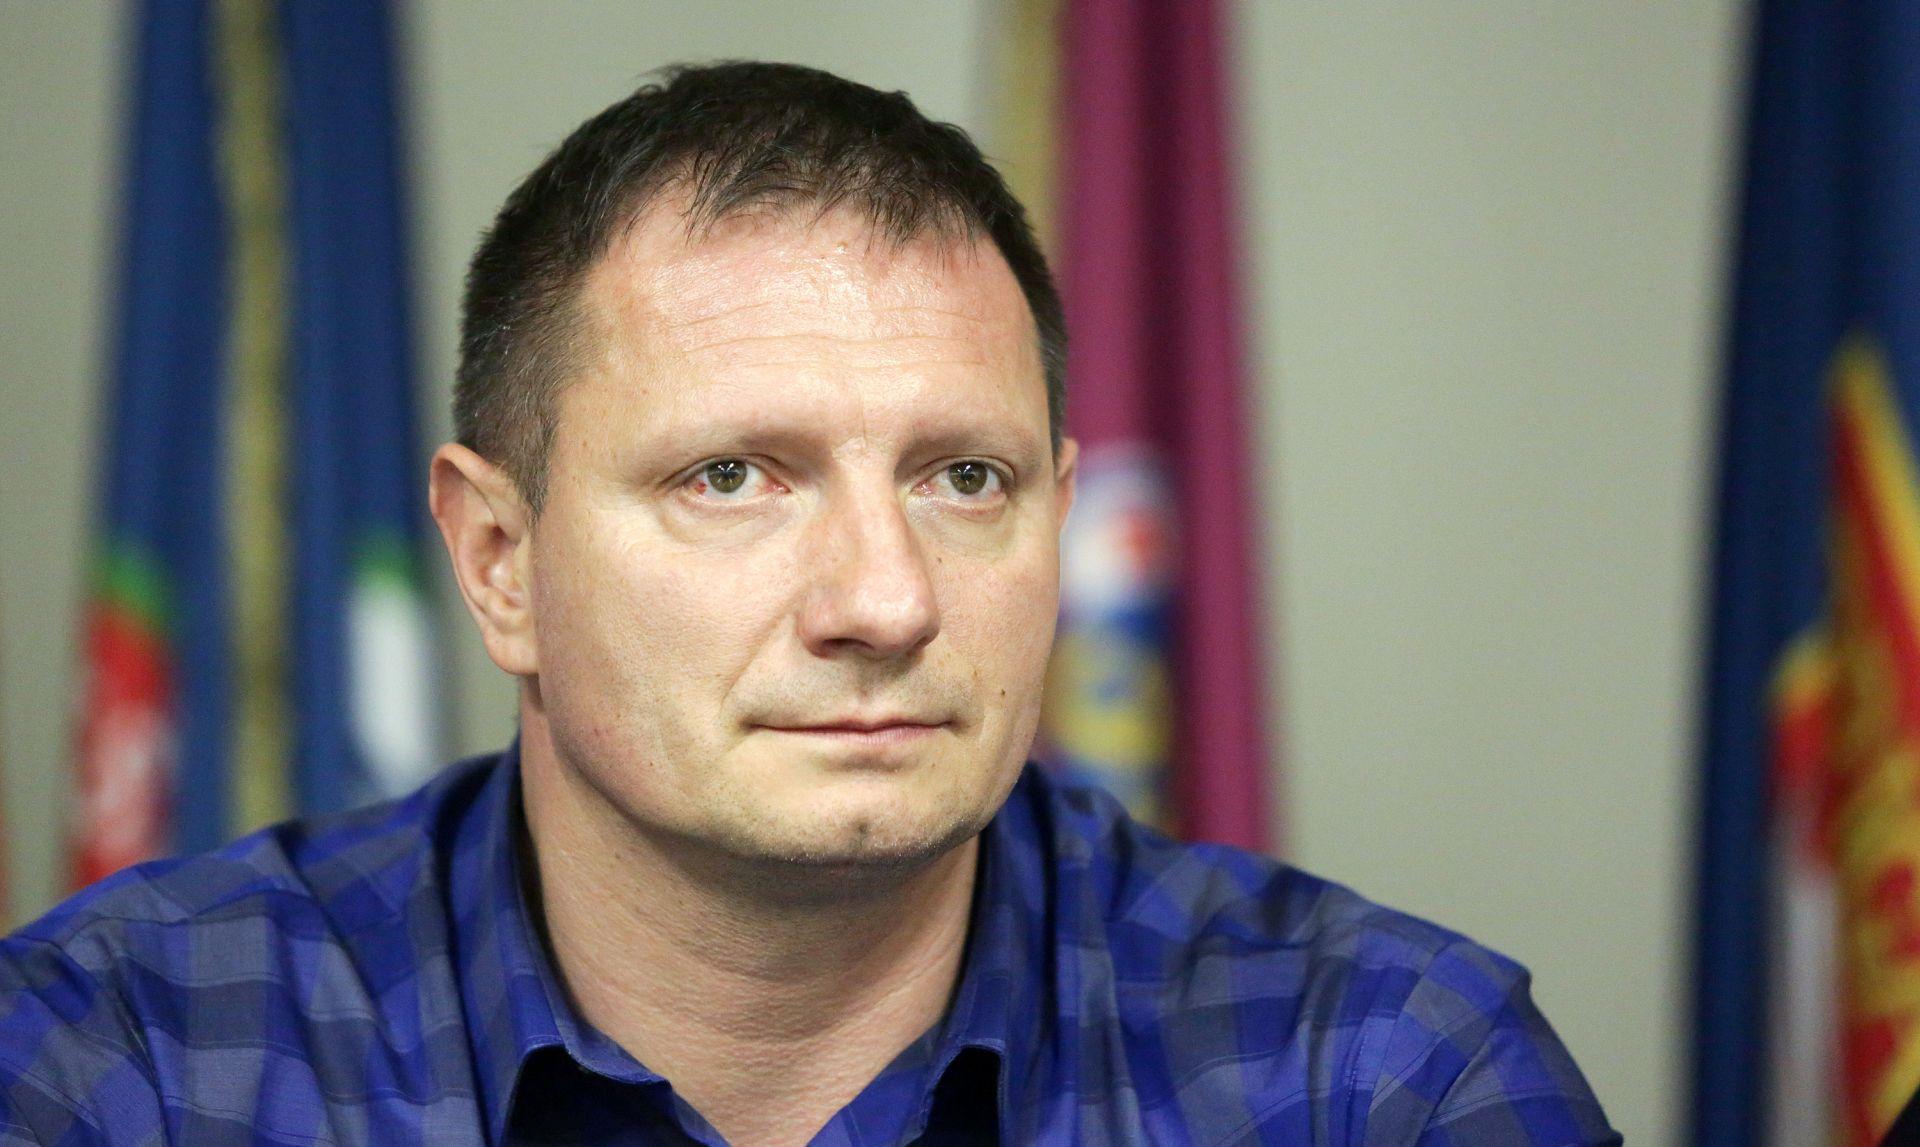 UTAJA POREZA NA DOBIT Potvrđena optužnica protiv Josipa Klemma